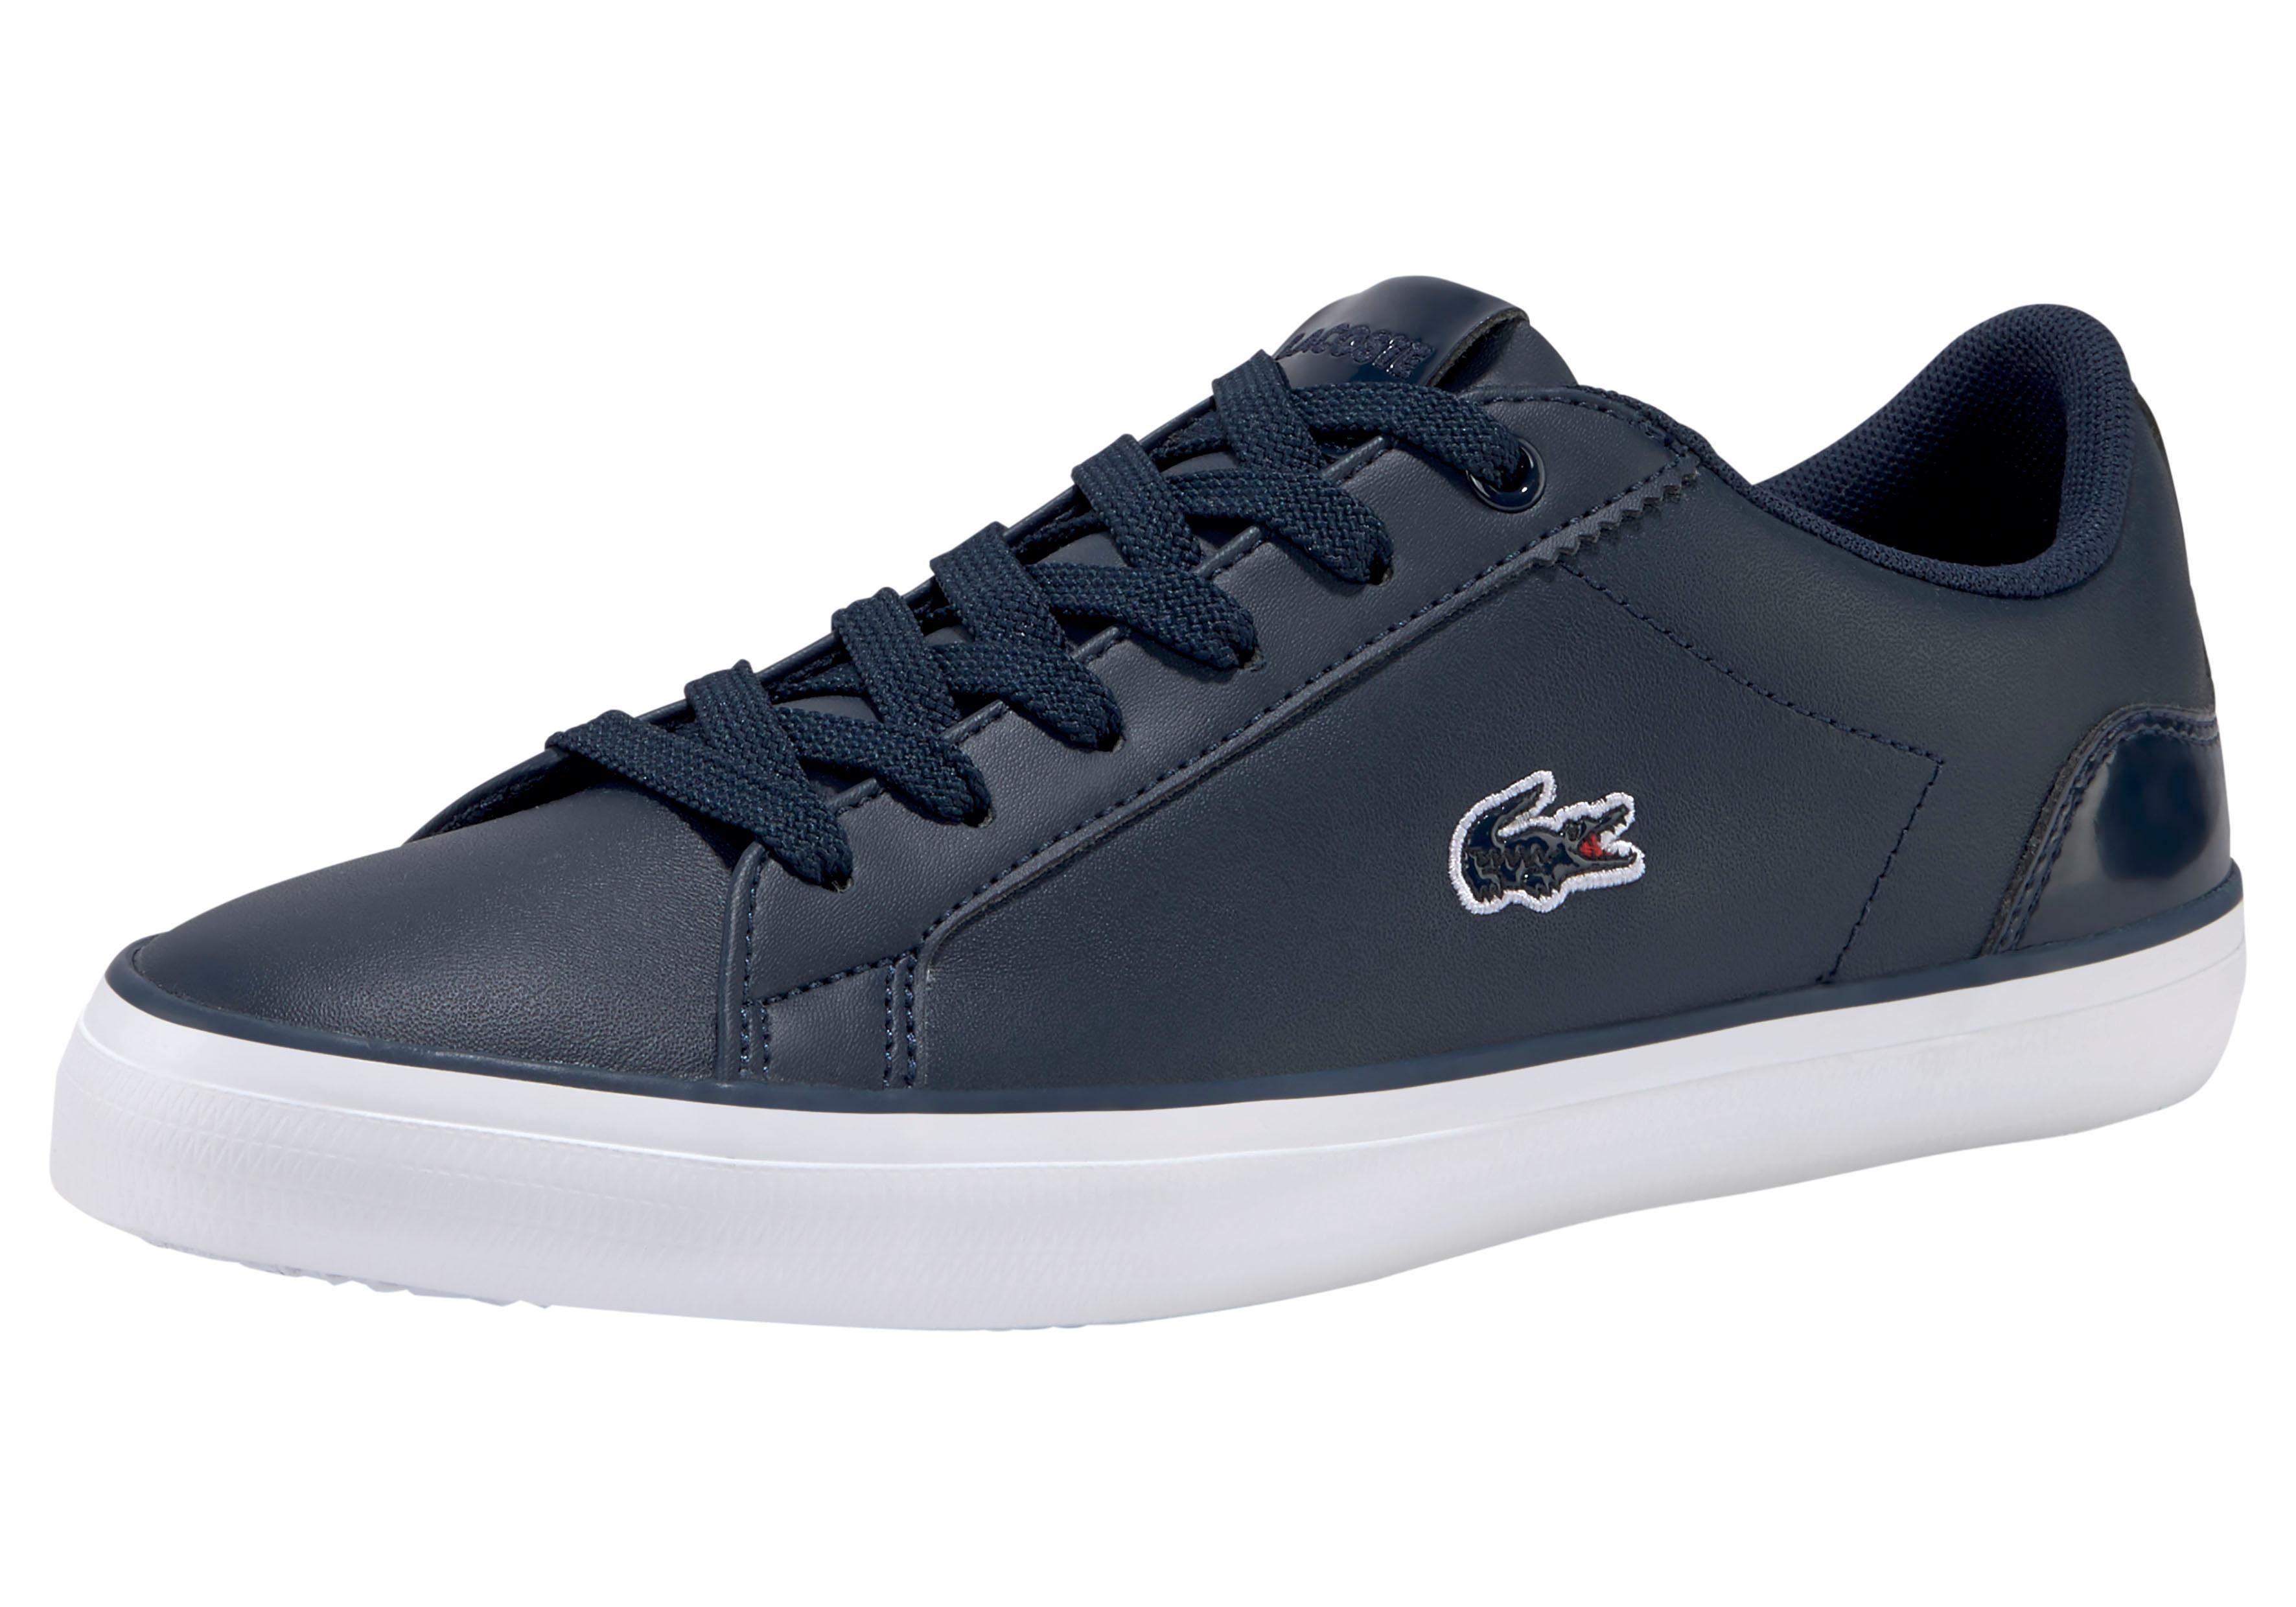 Qsp Sneaker Kaufen 118 Caw Lacoste lerond Otto 1 cAgfyxtnW